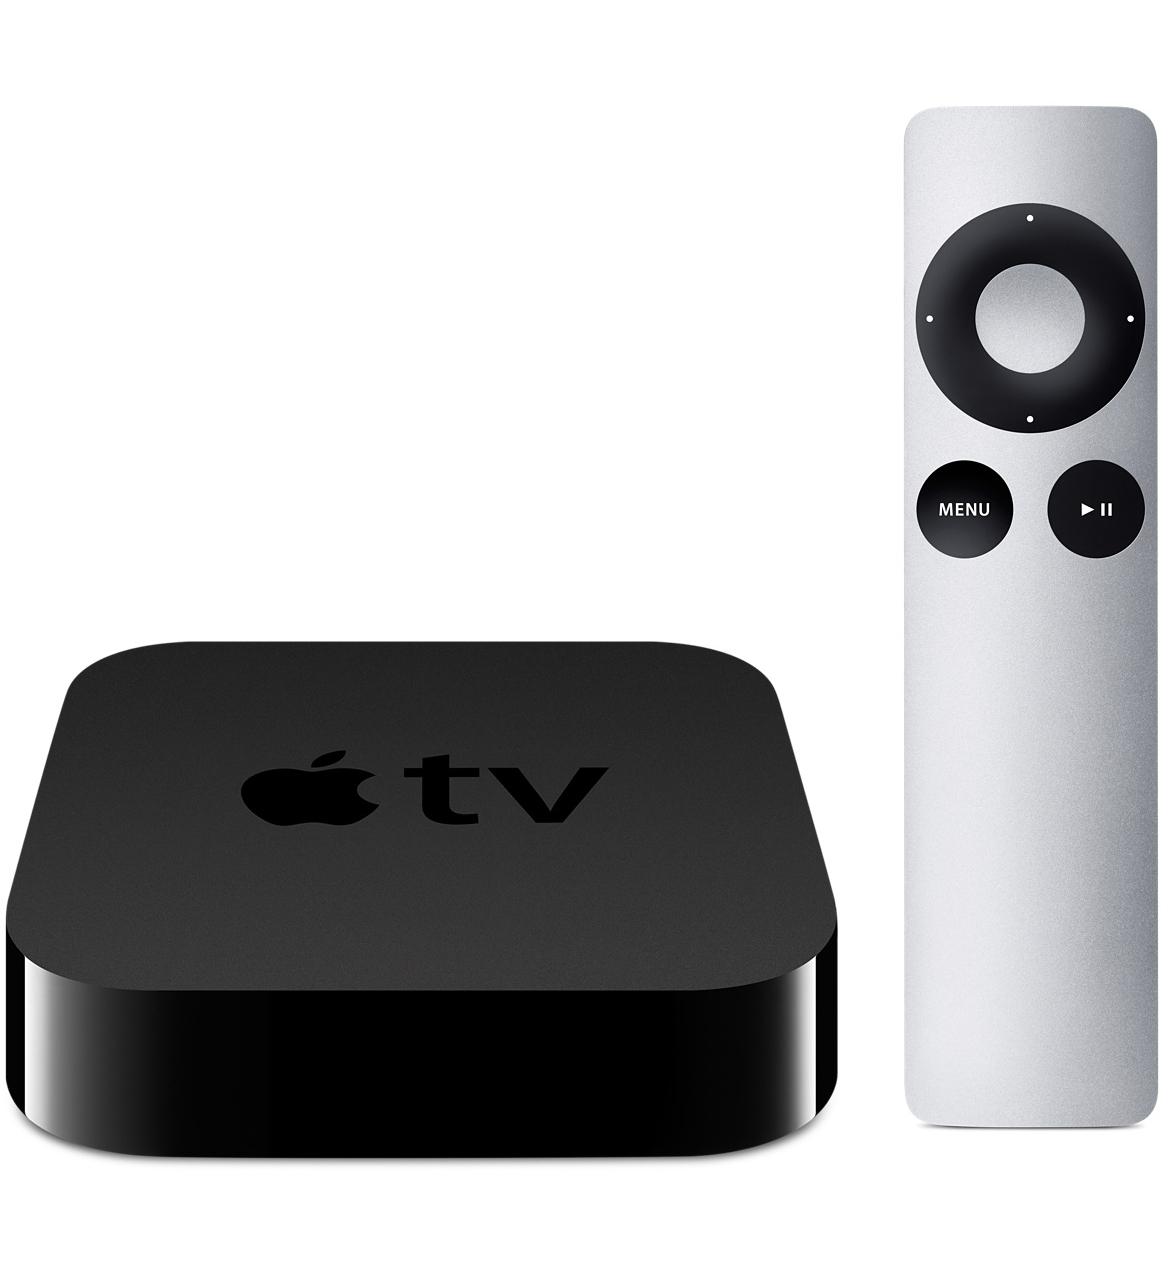 My now-useless 3rd-Gen Apple TV. It still has 1080p, but no more HomeKit utility with iOS 10. Whomp. 📷 via  Apple.com .